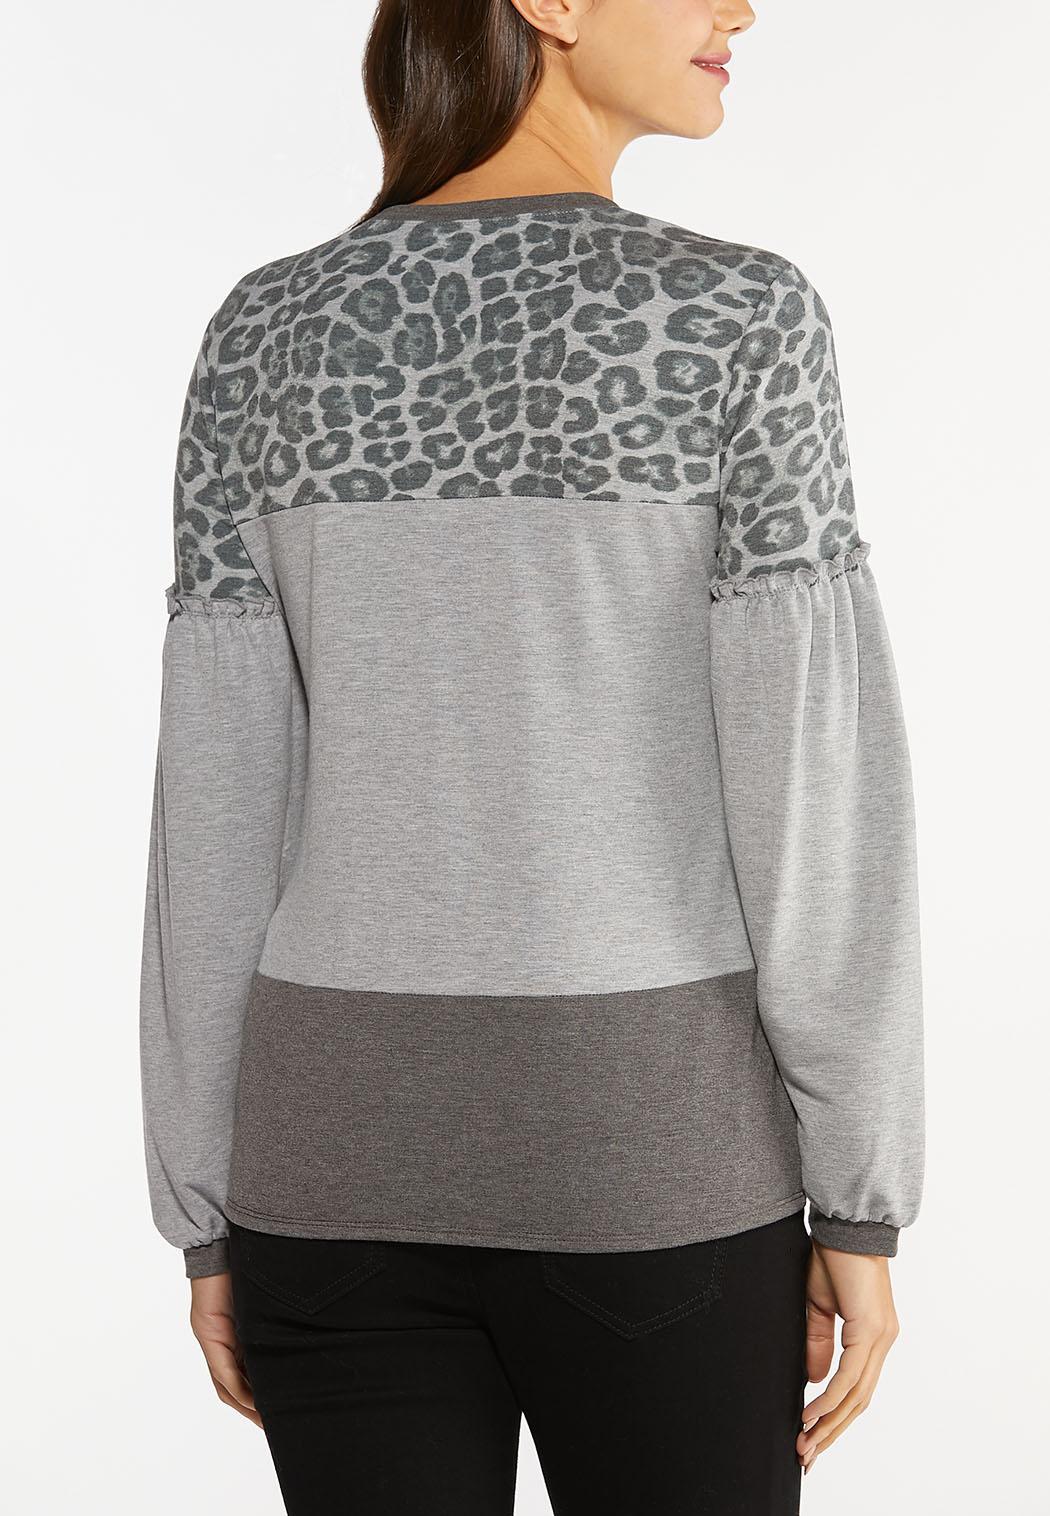 Plus Size Colorblock Animal Tie Front Top (Item #44490456)